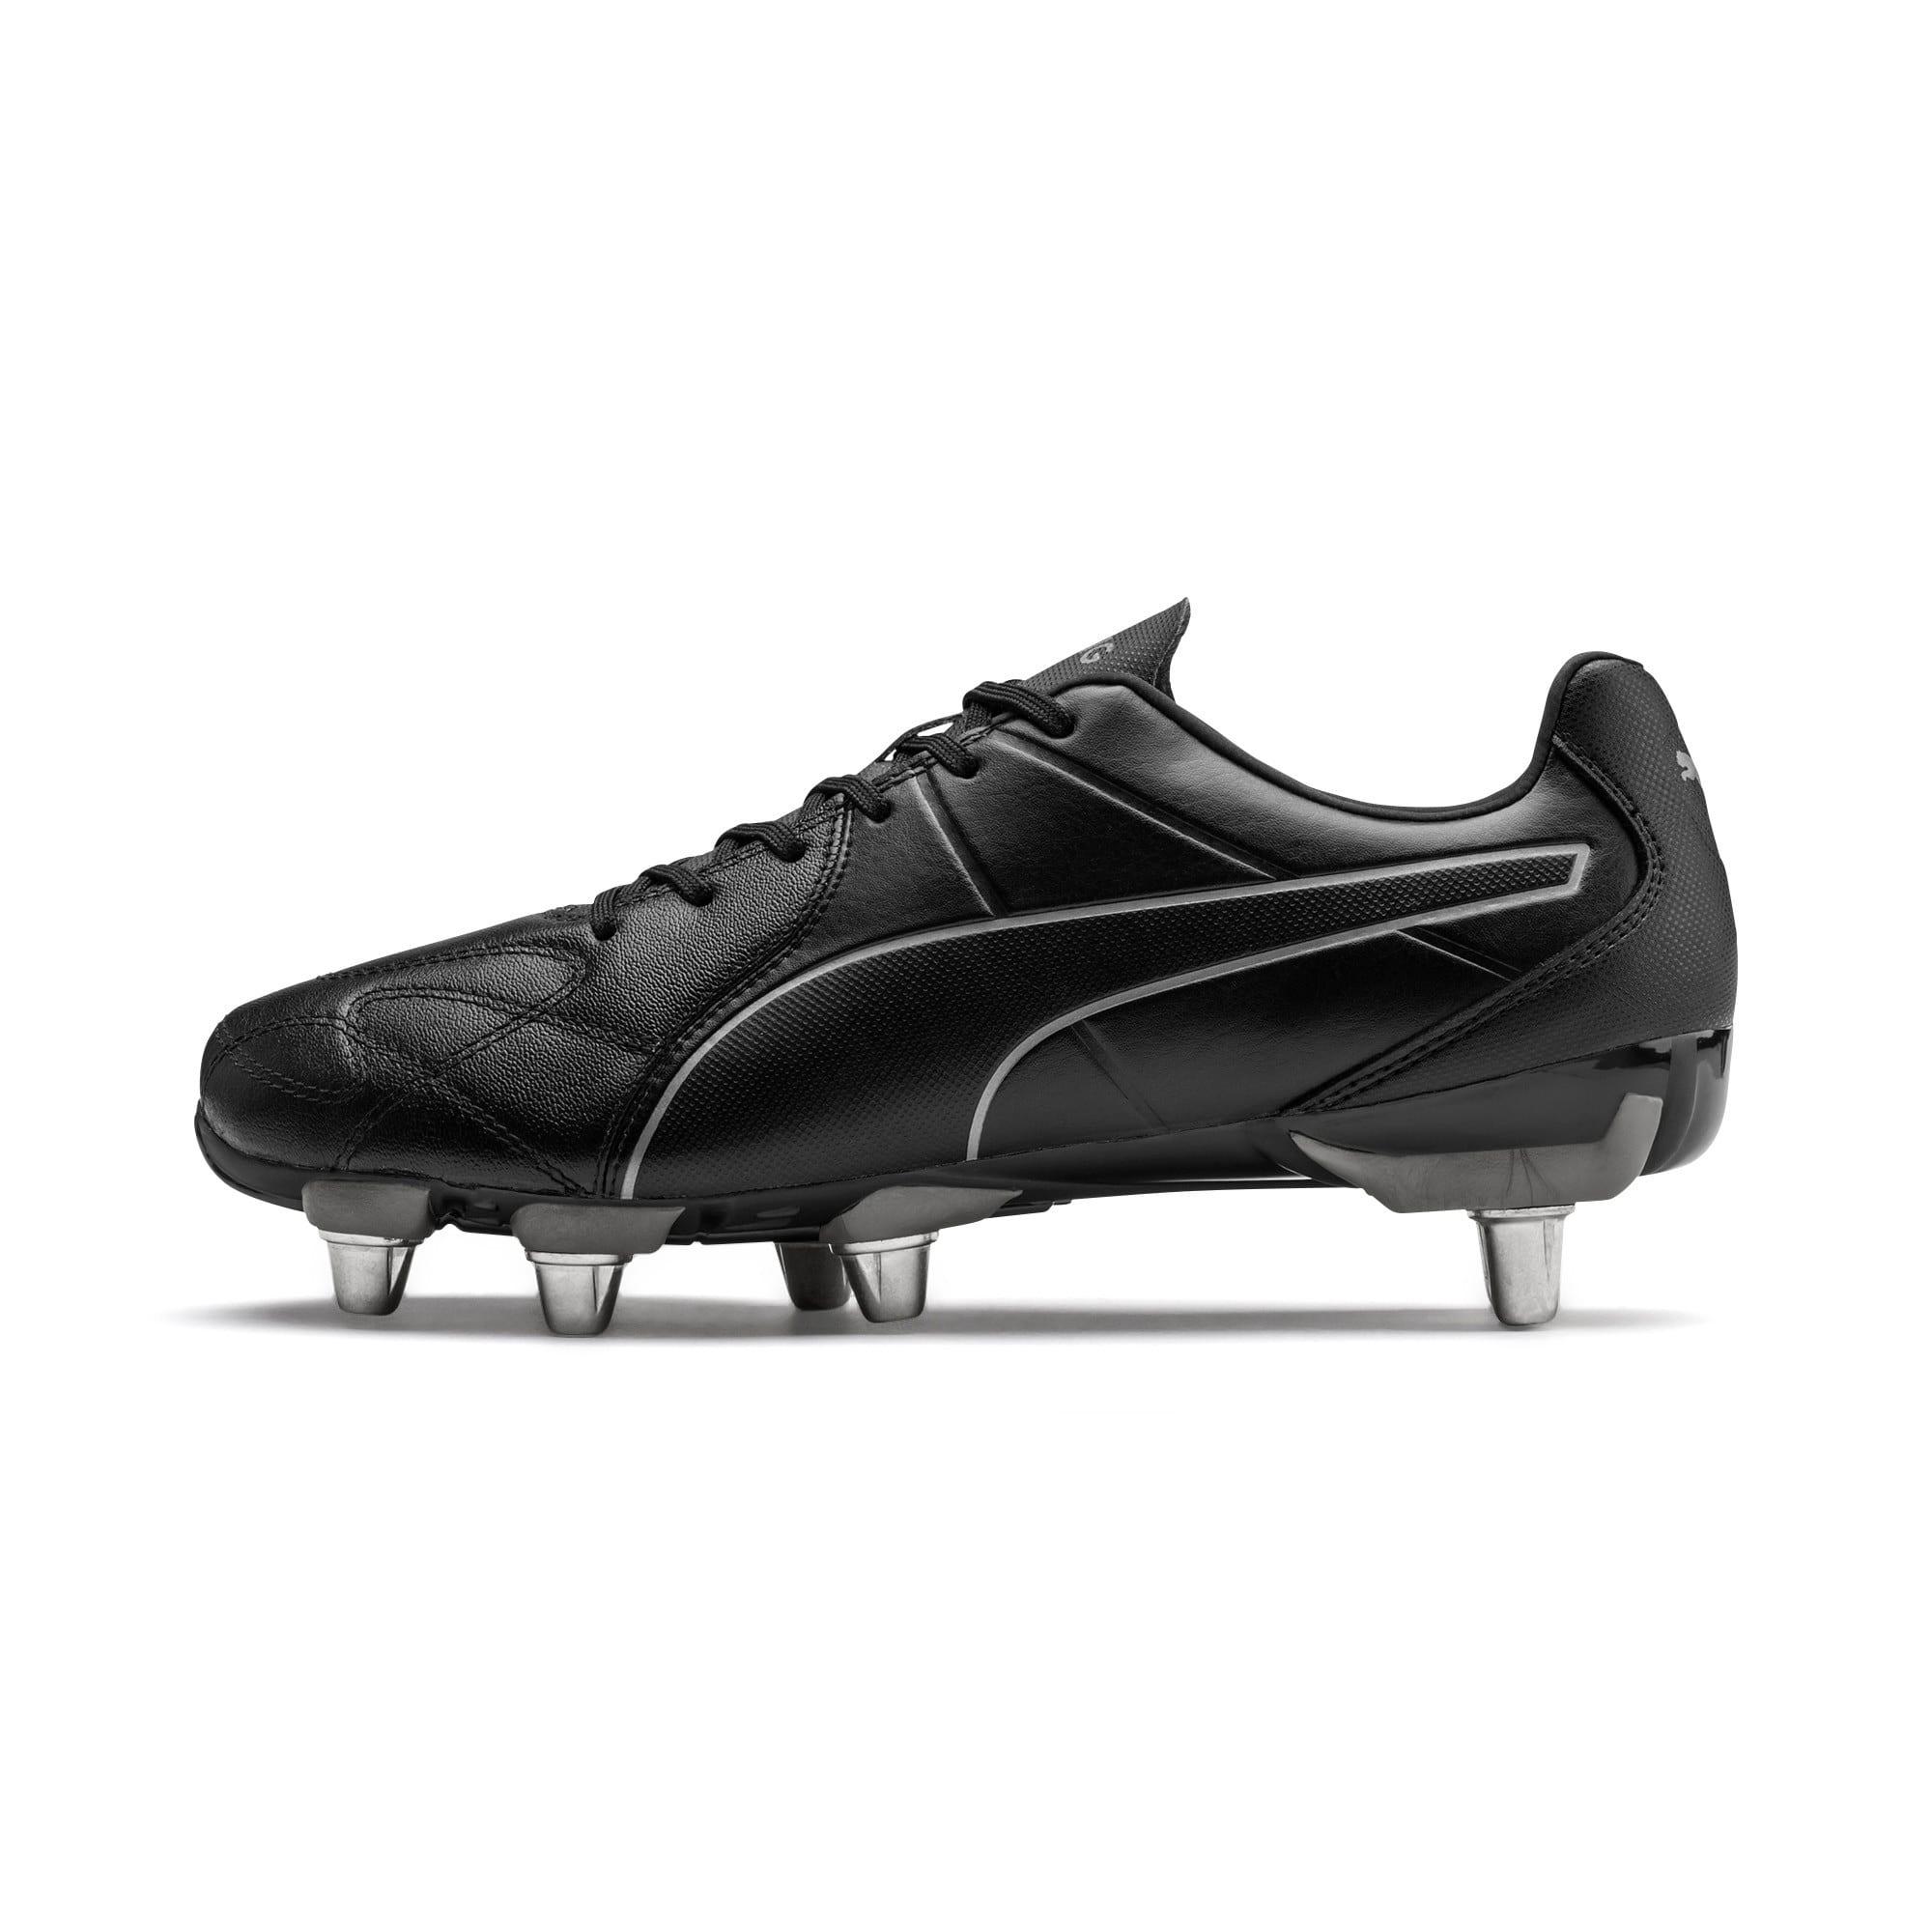 Thumbnail 1 of KING Hero H8 Men's Rugby Boots, Puma Black-Puma Aged Silver, medium